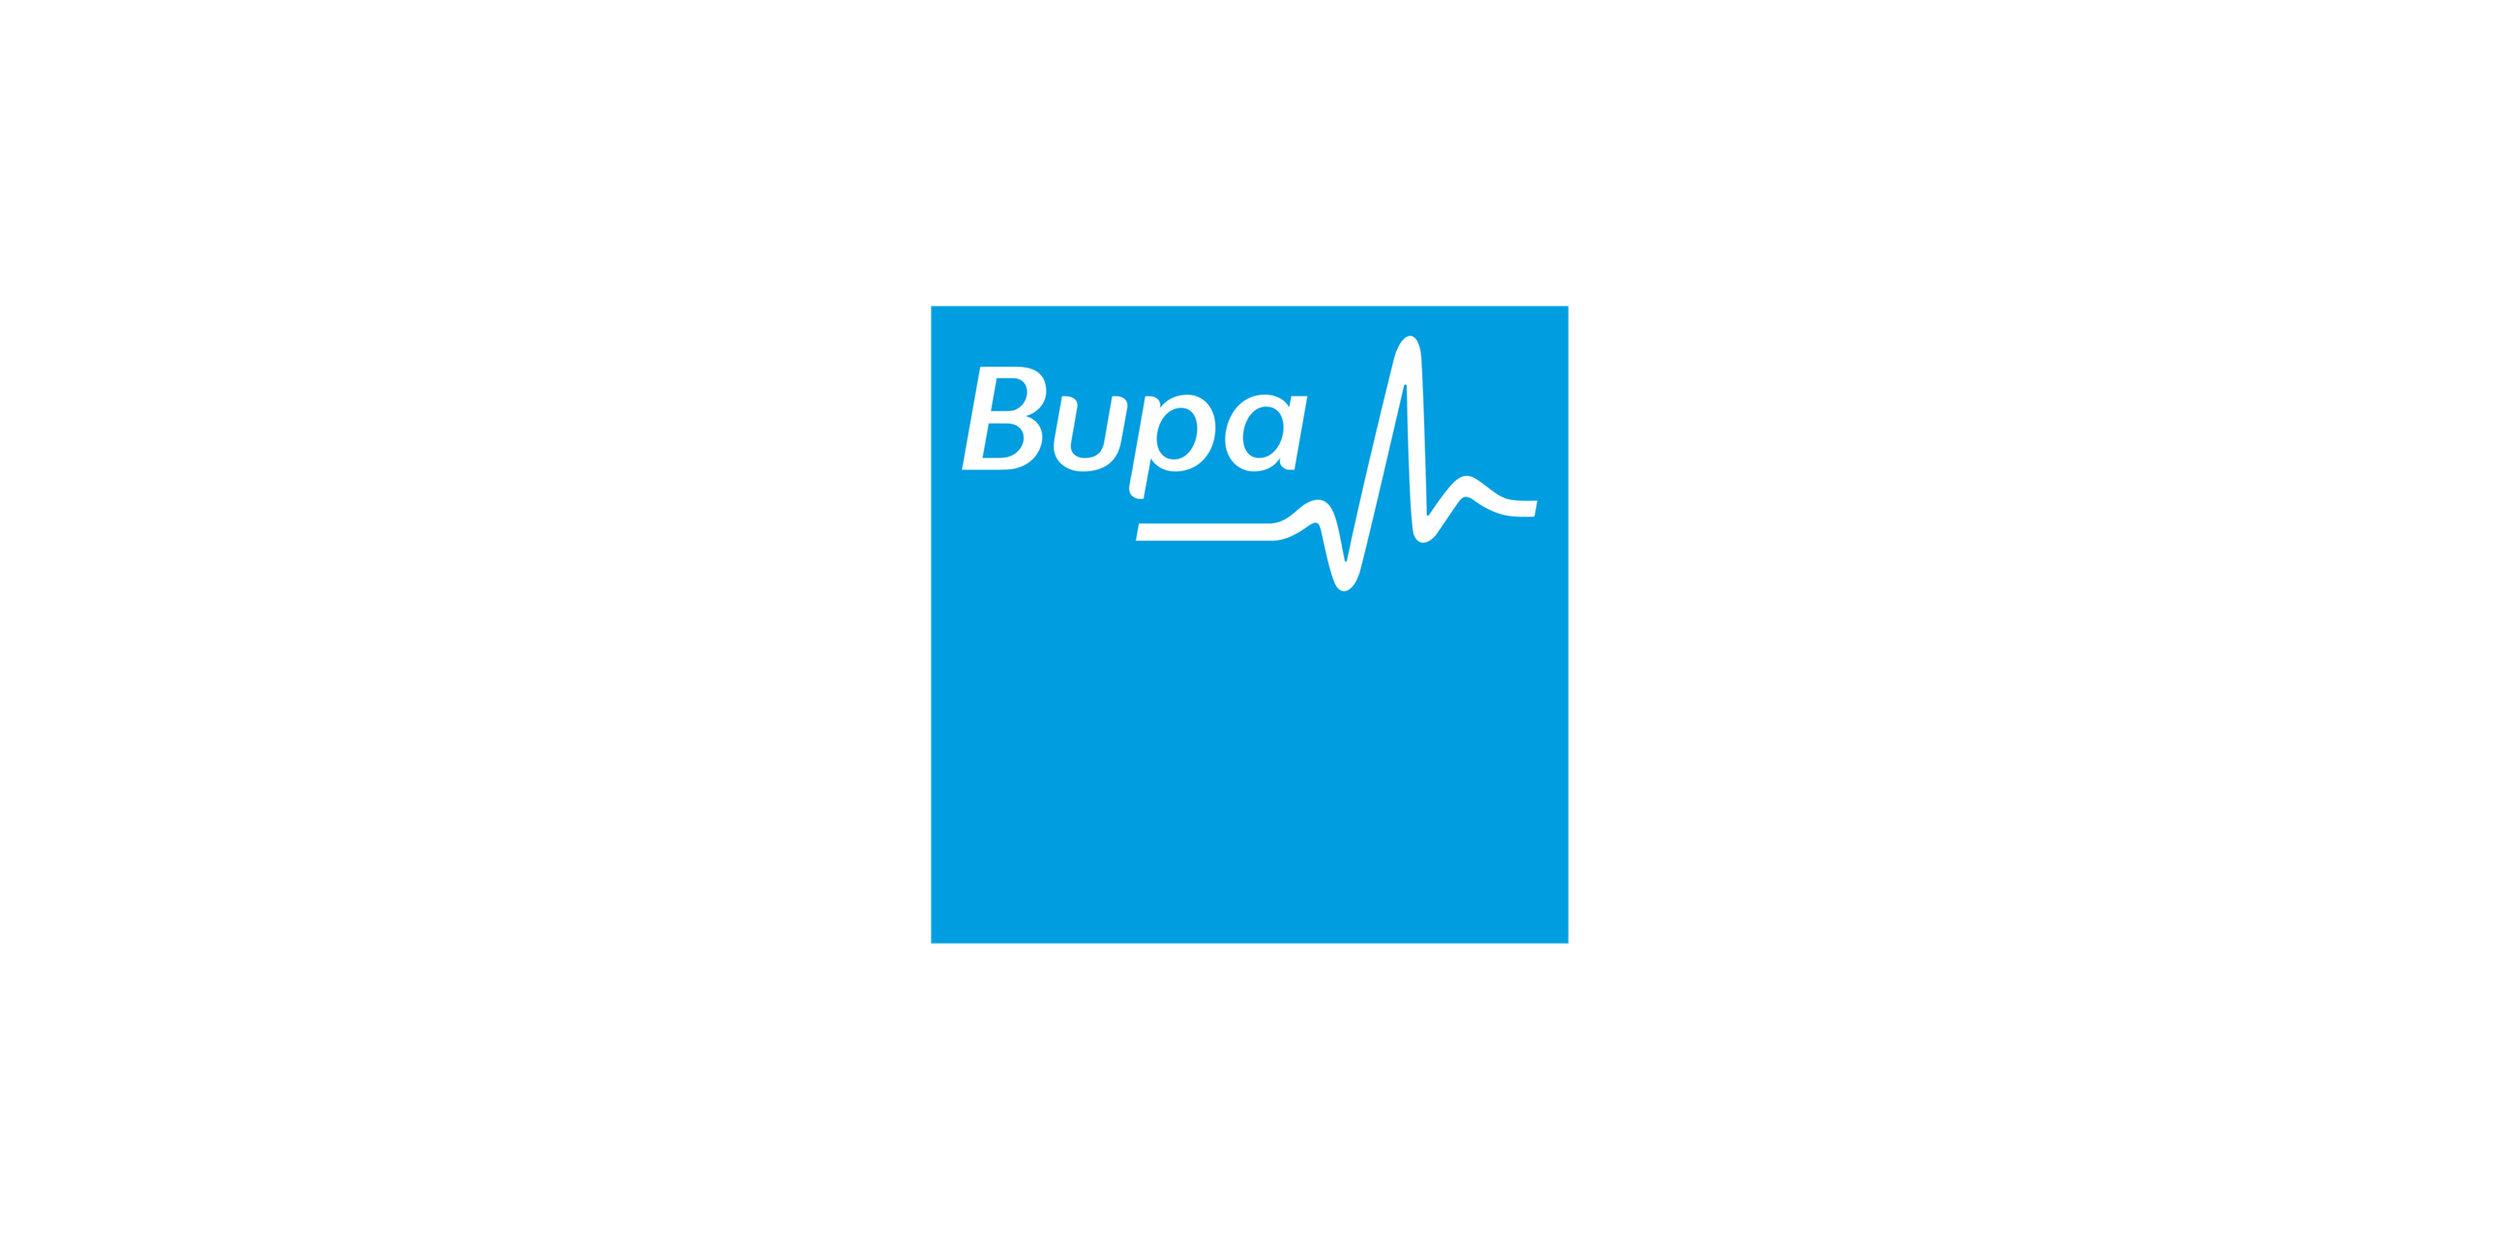 Bupa_1q.jpg